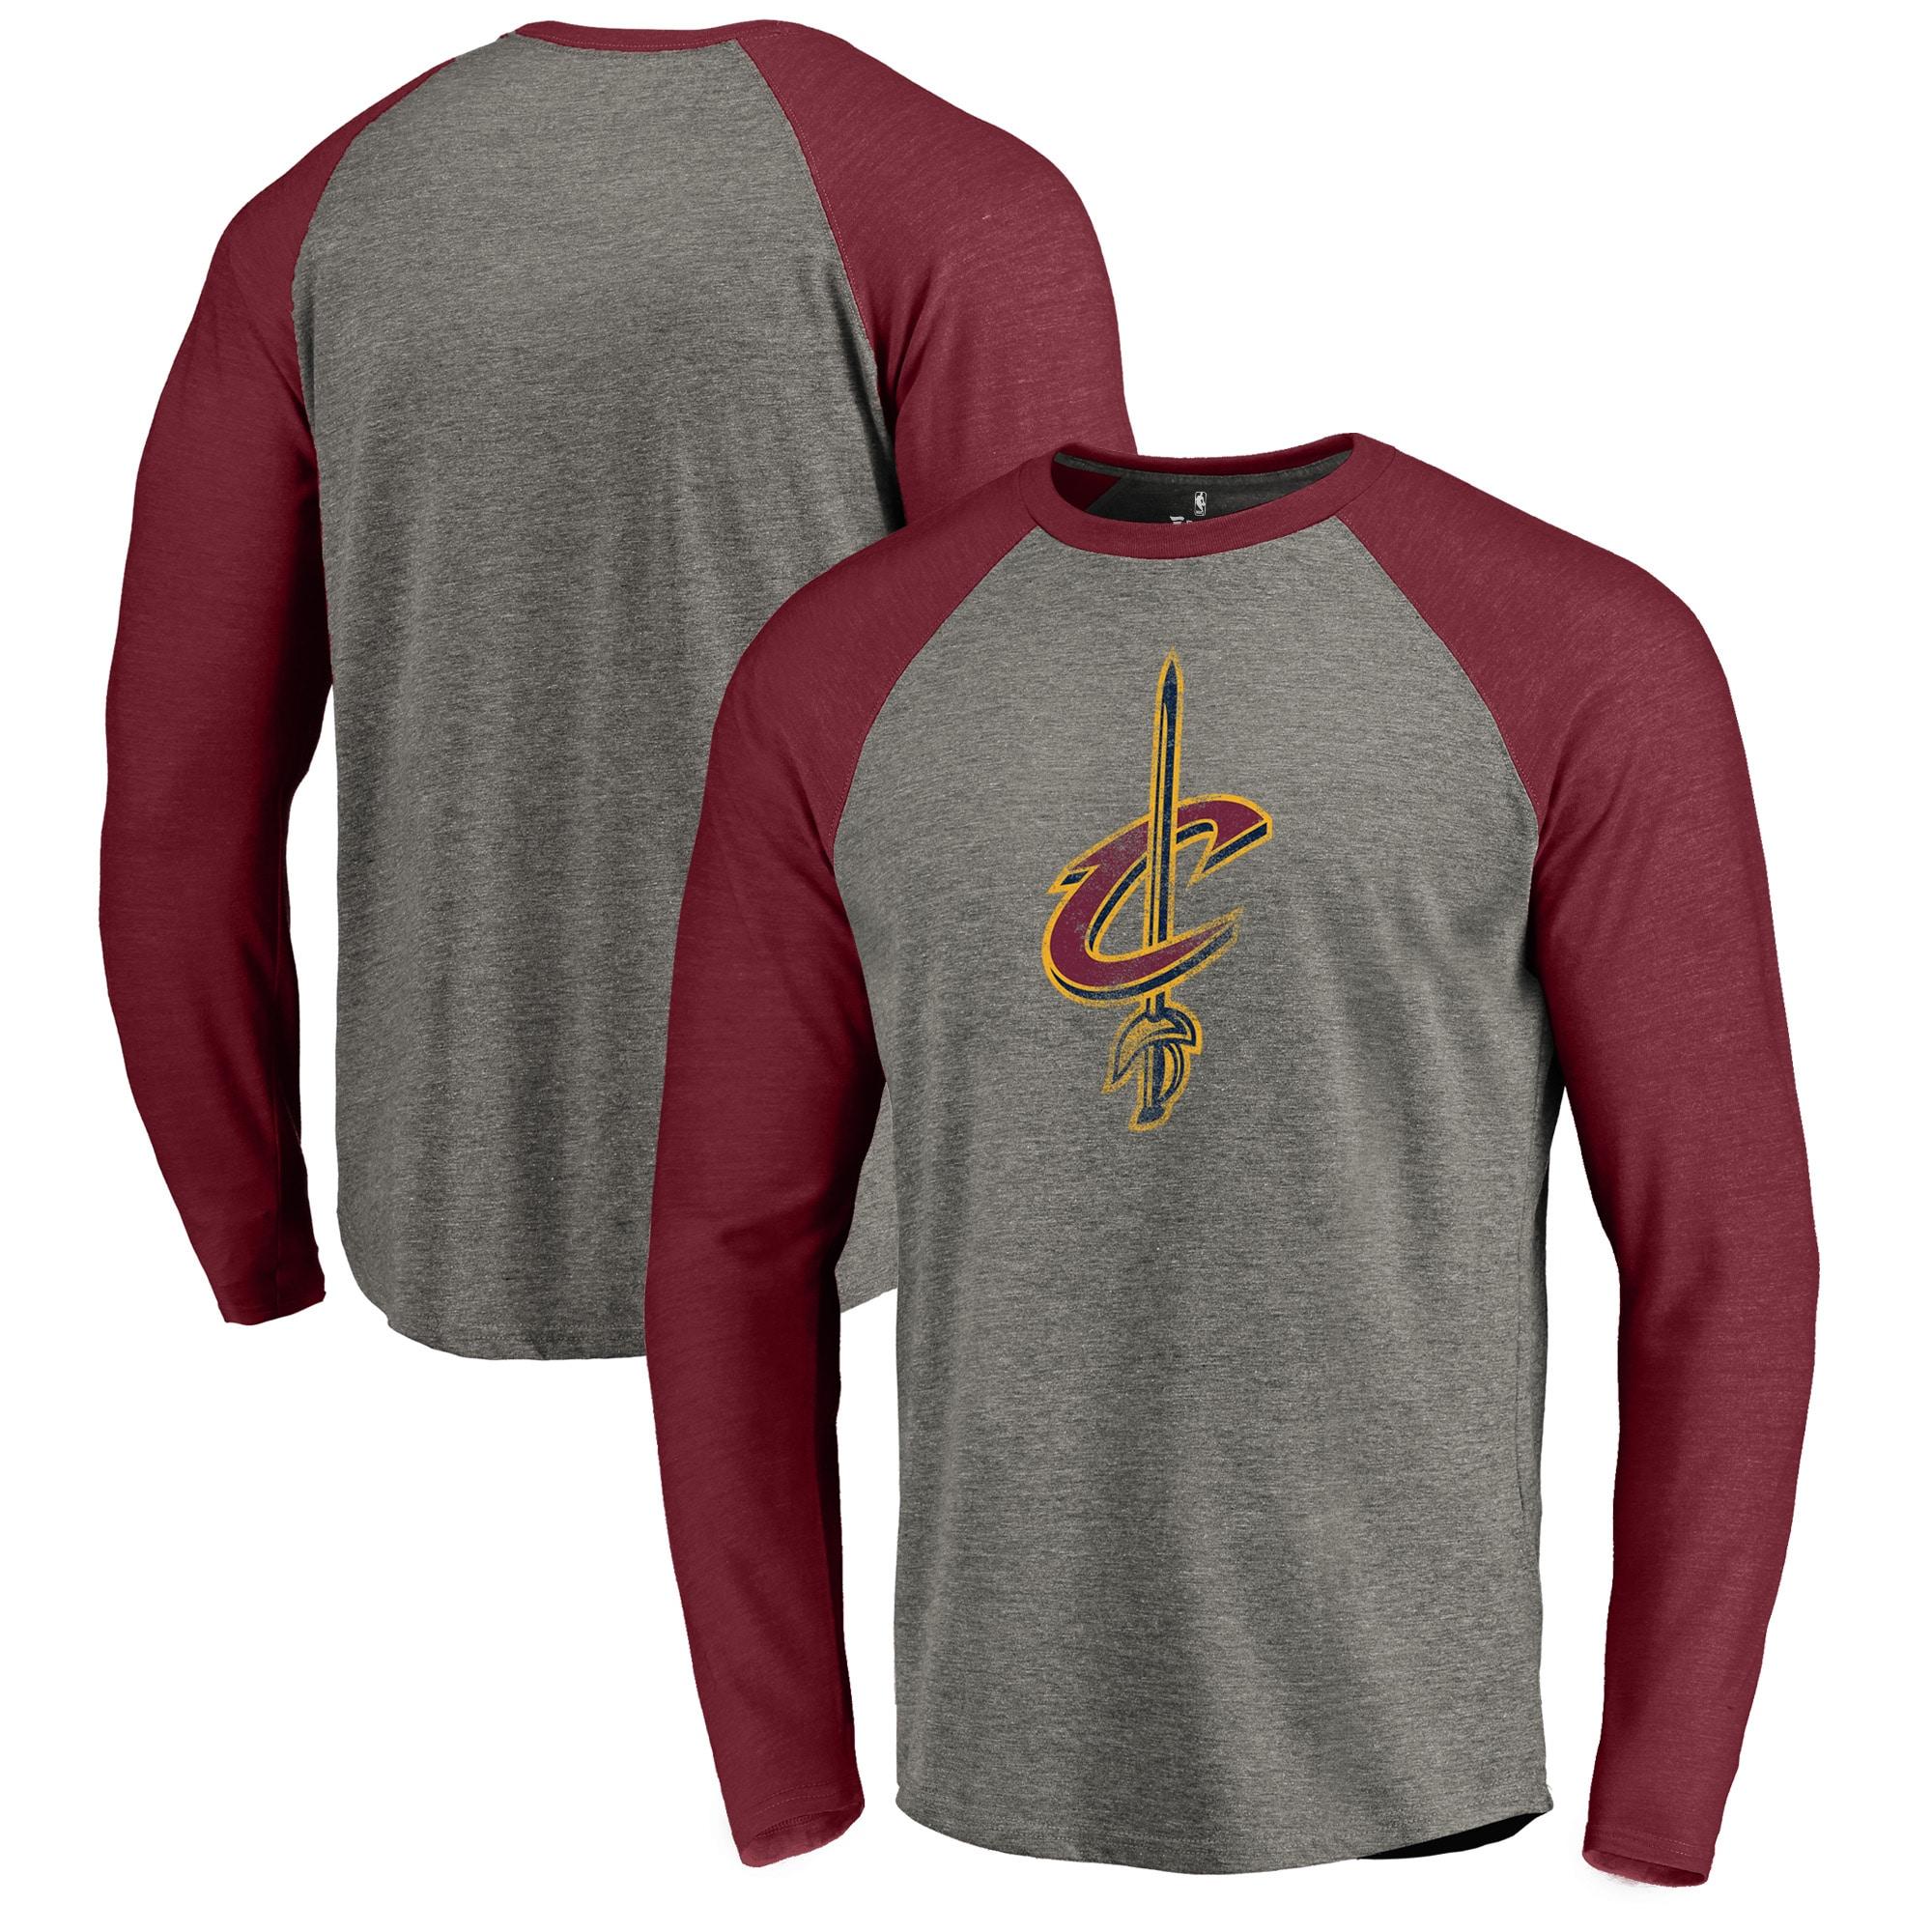 Cleveland Cavaliers Fanatics Branded Distressed Logo Tri-Blend Raglan Long Sleeve T-Shirt - Ash/Wine